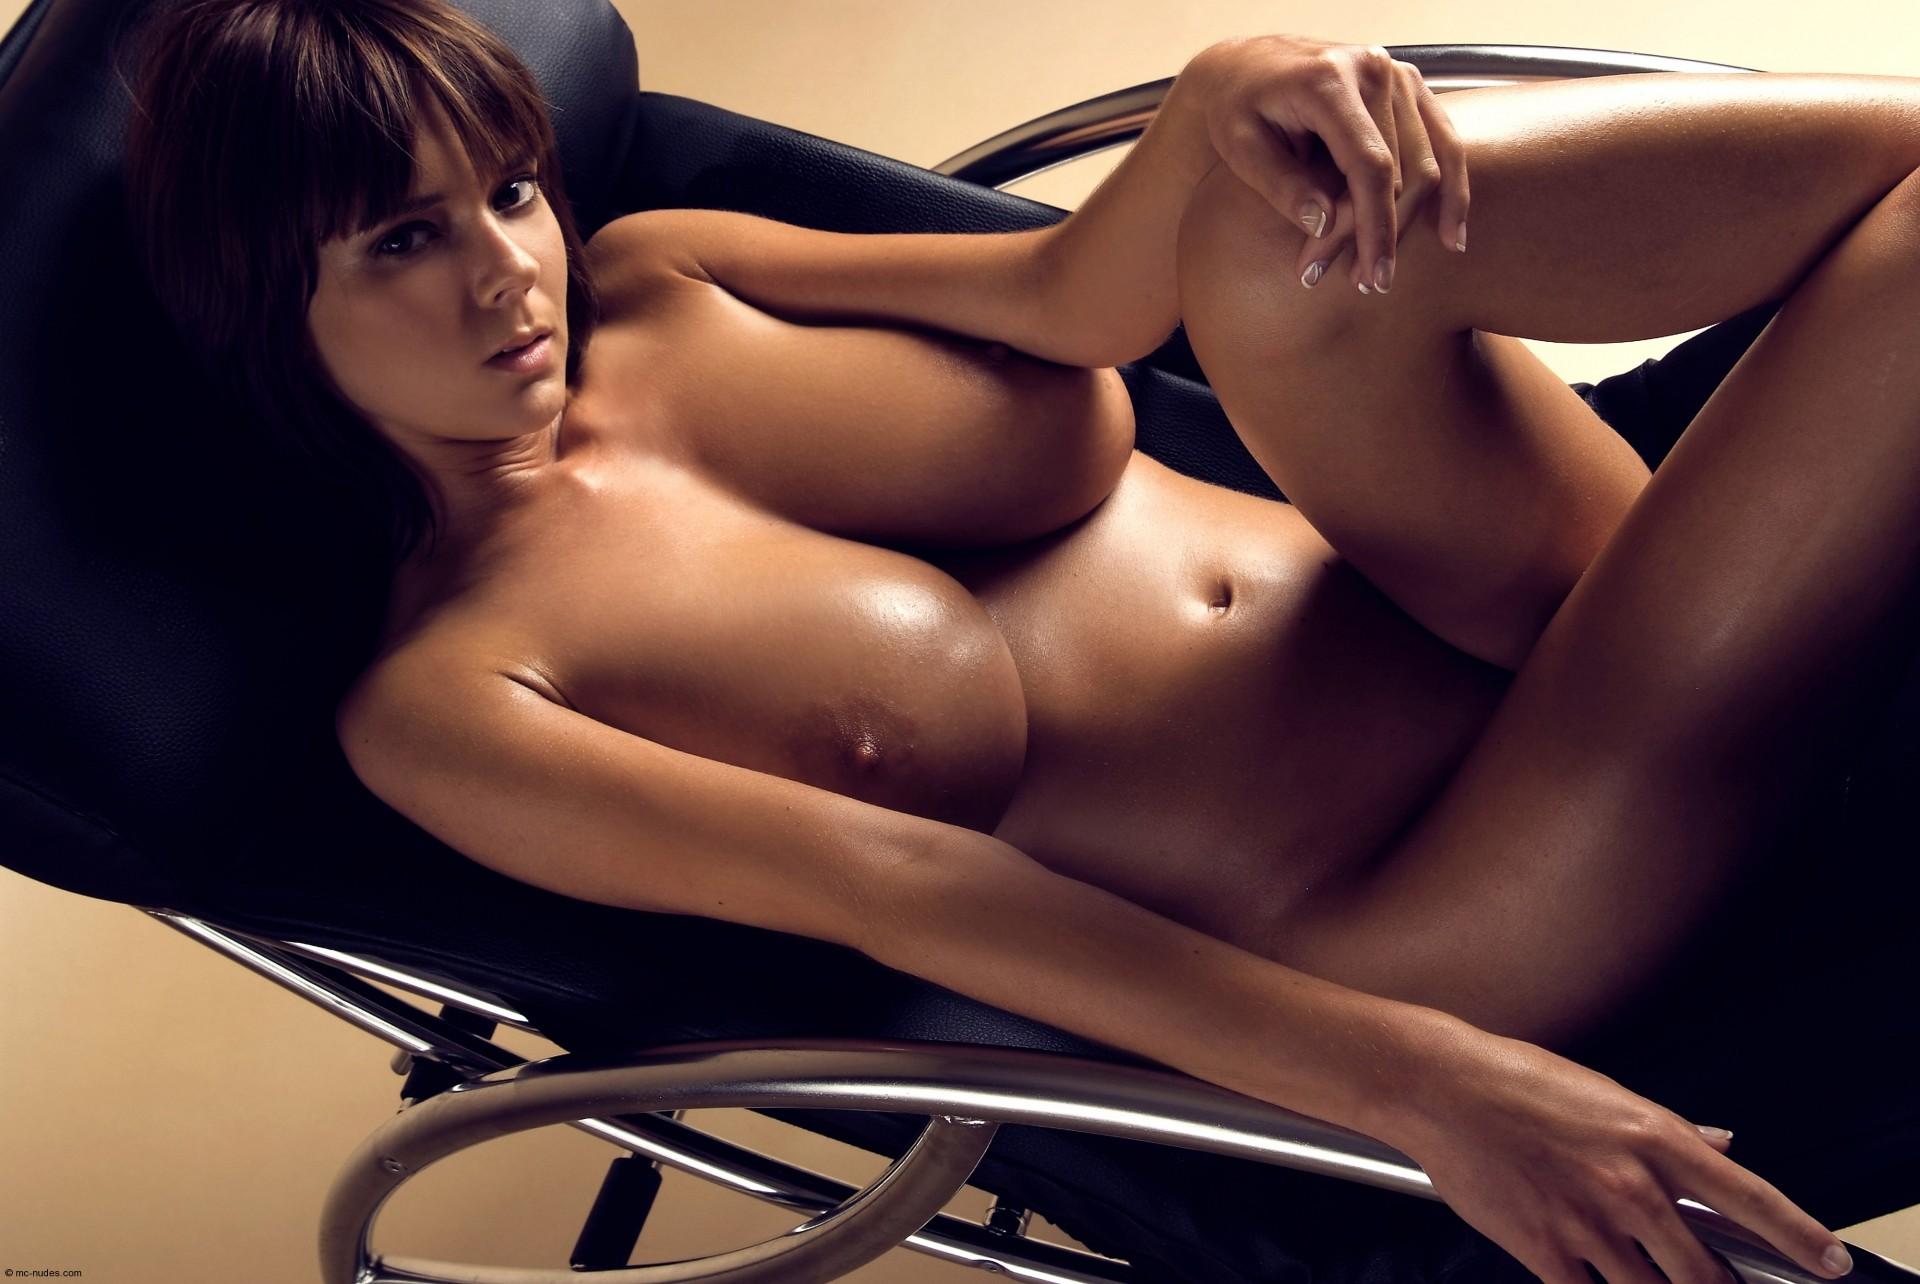 beaty-full-sex-women-hot-free-photo-born